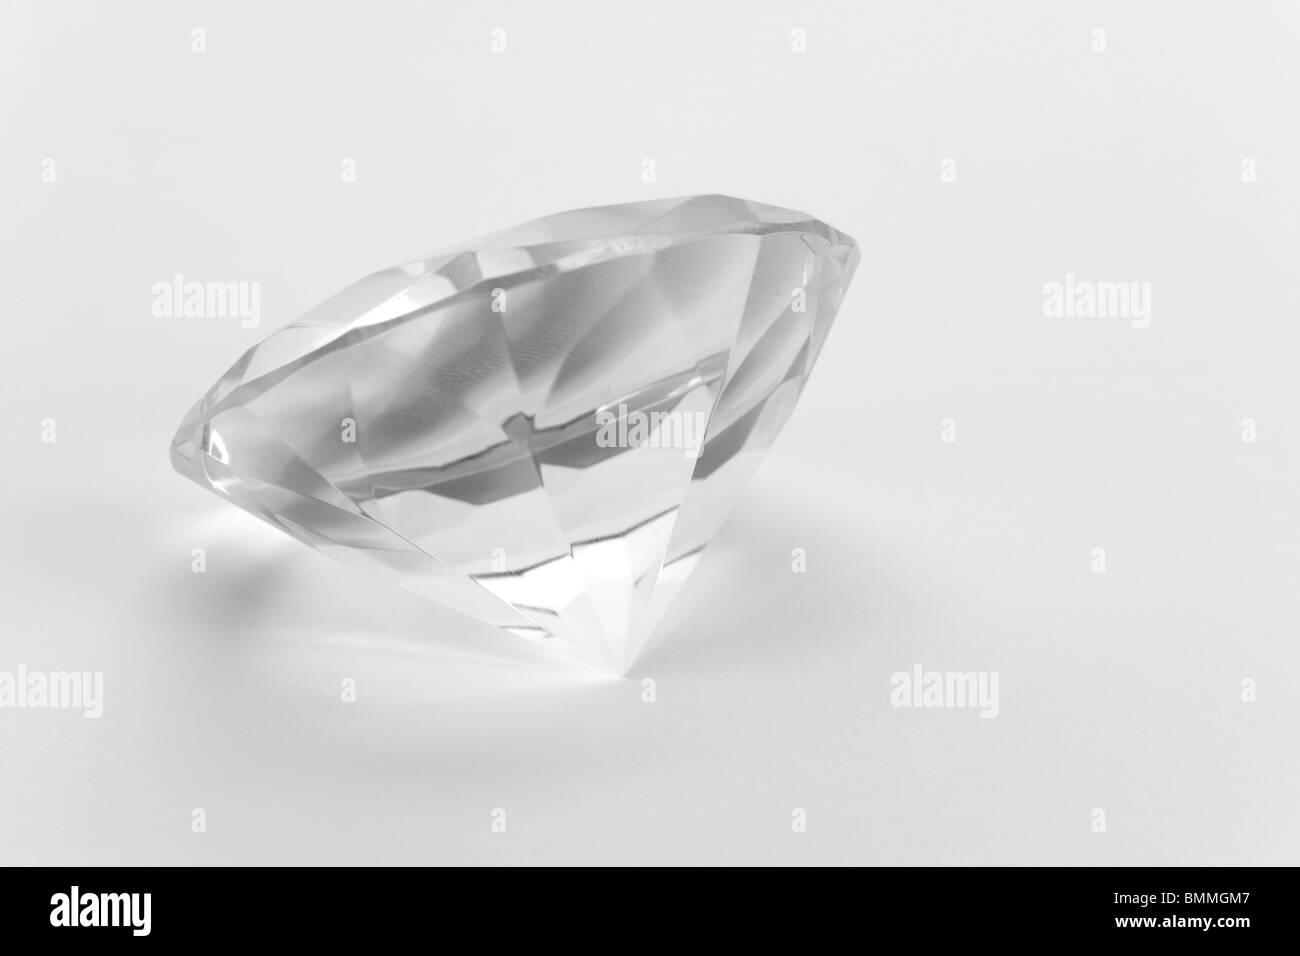 Diamond close up shot with white background - Stock Image